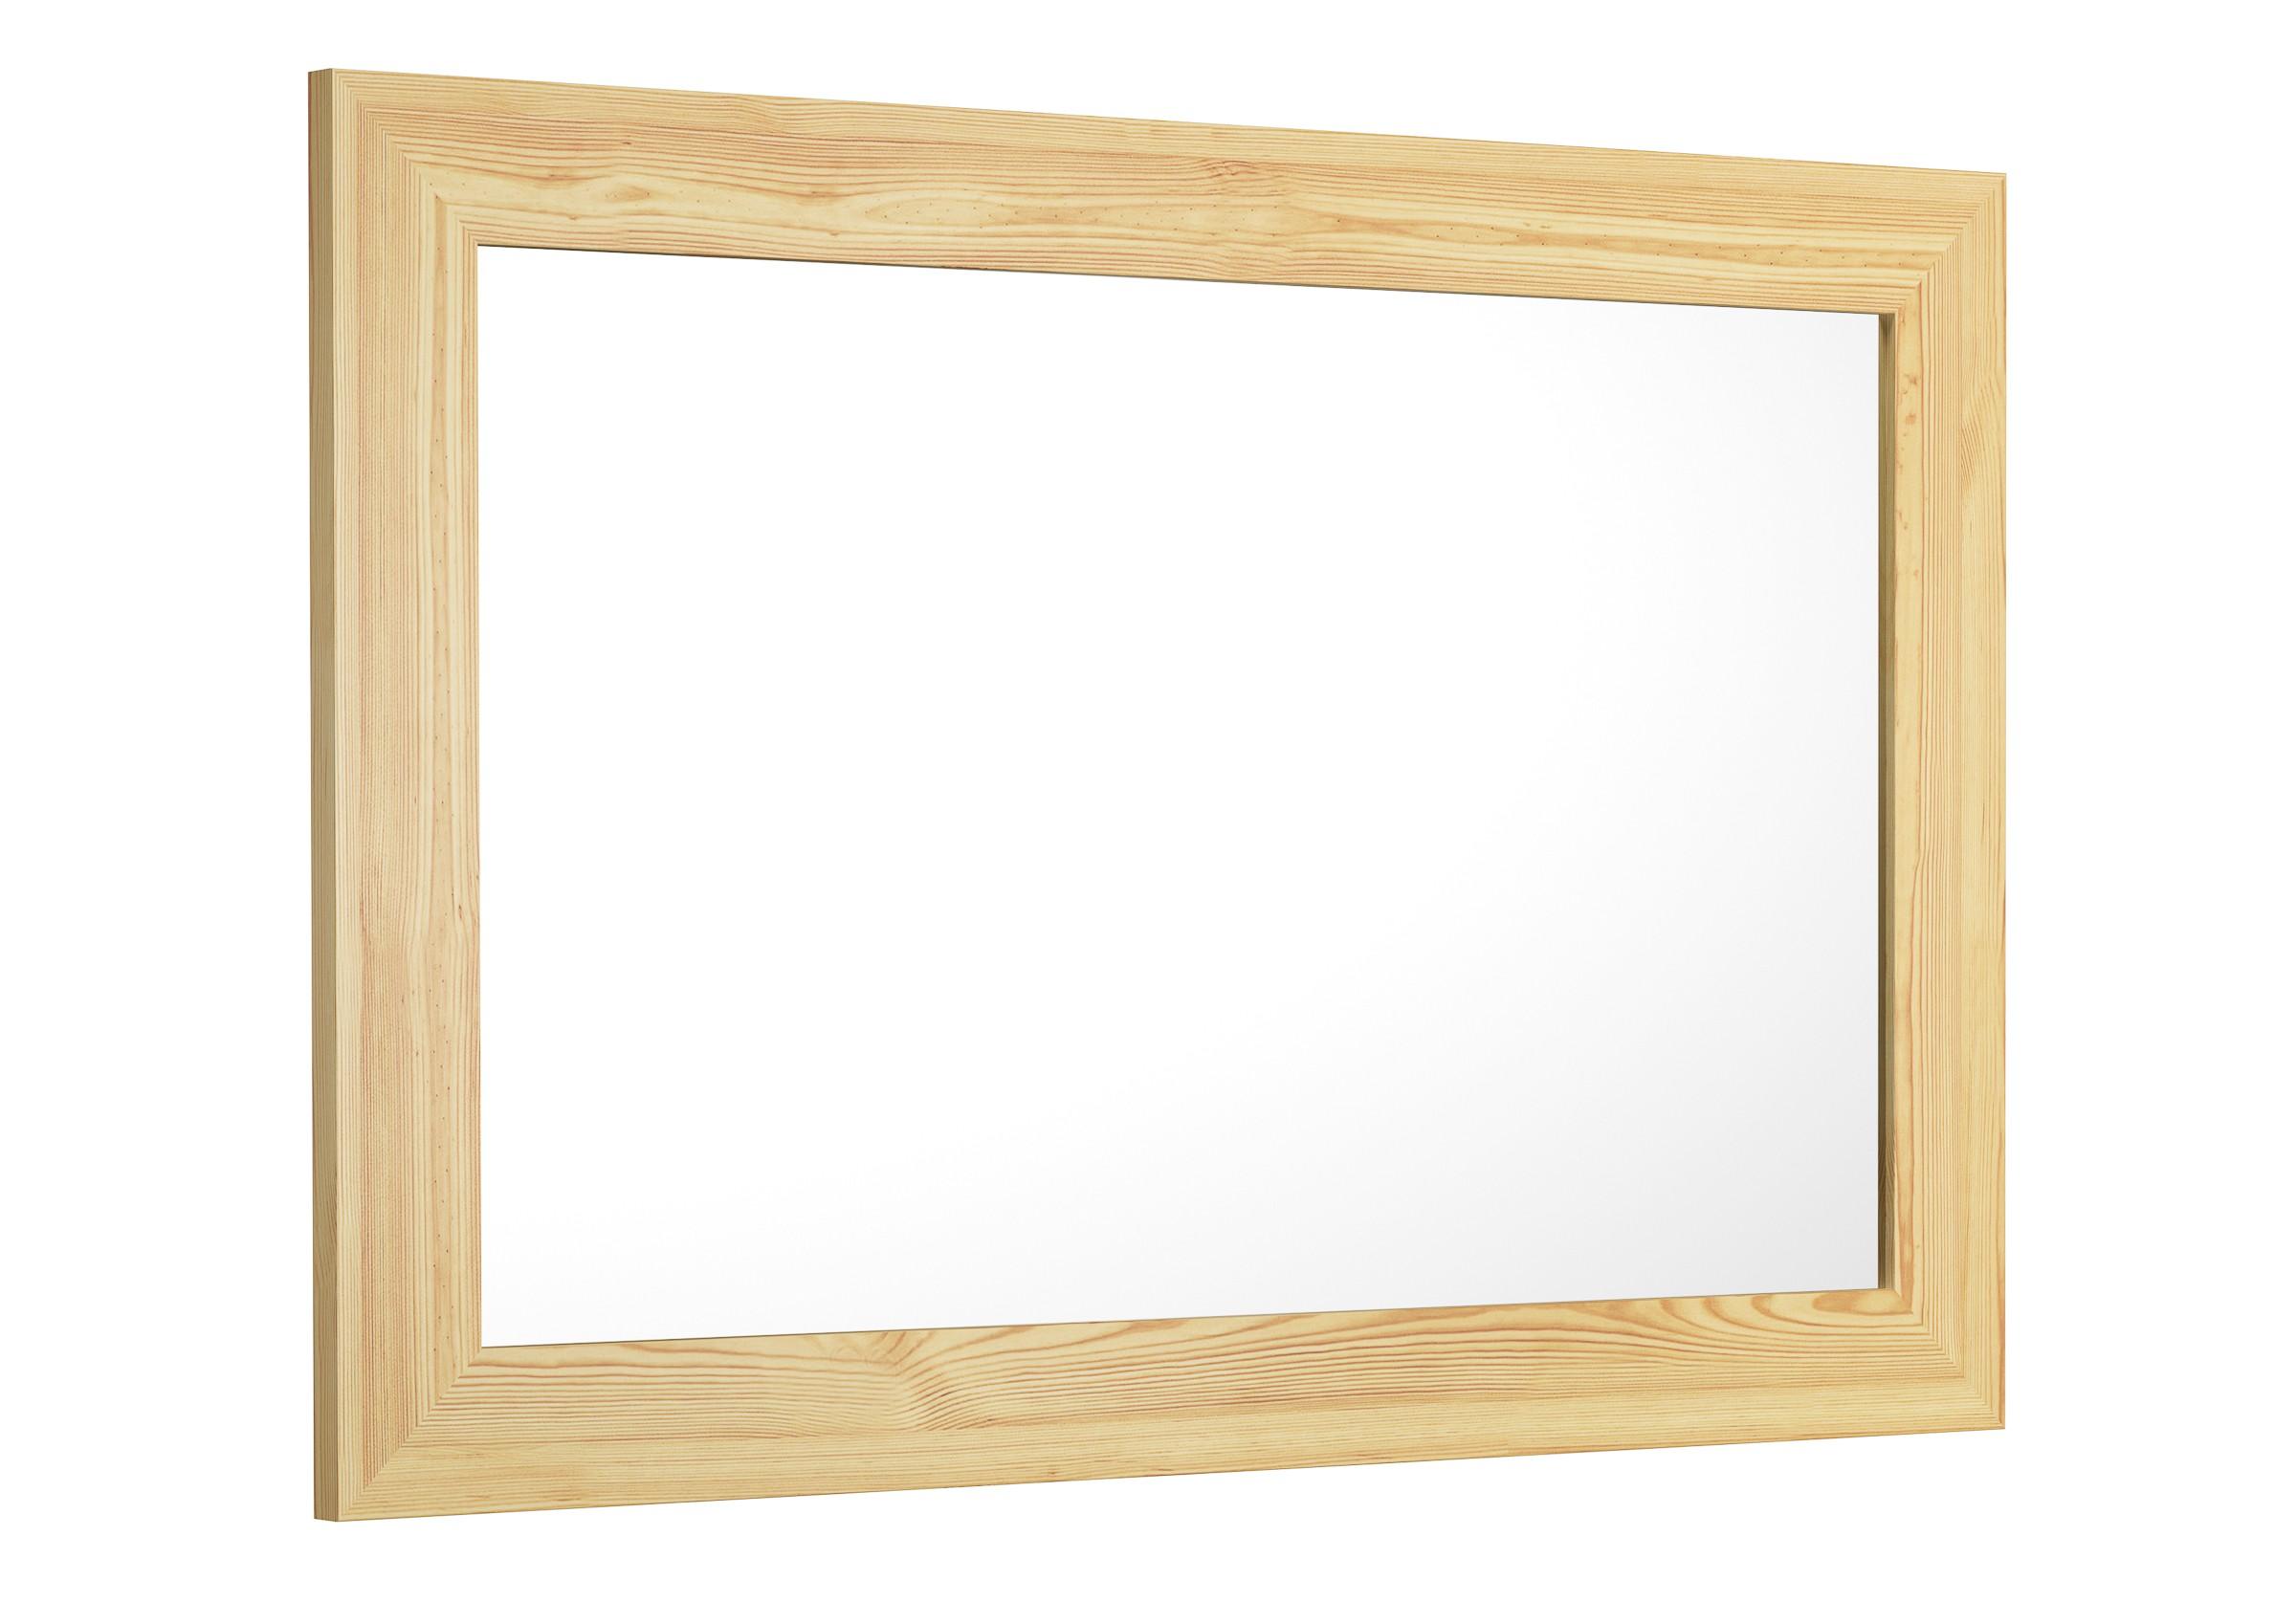 Garderobenspiegel Holz